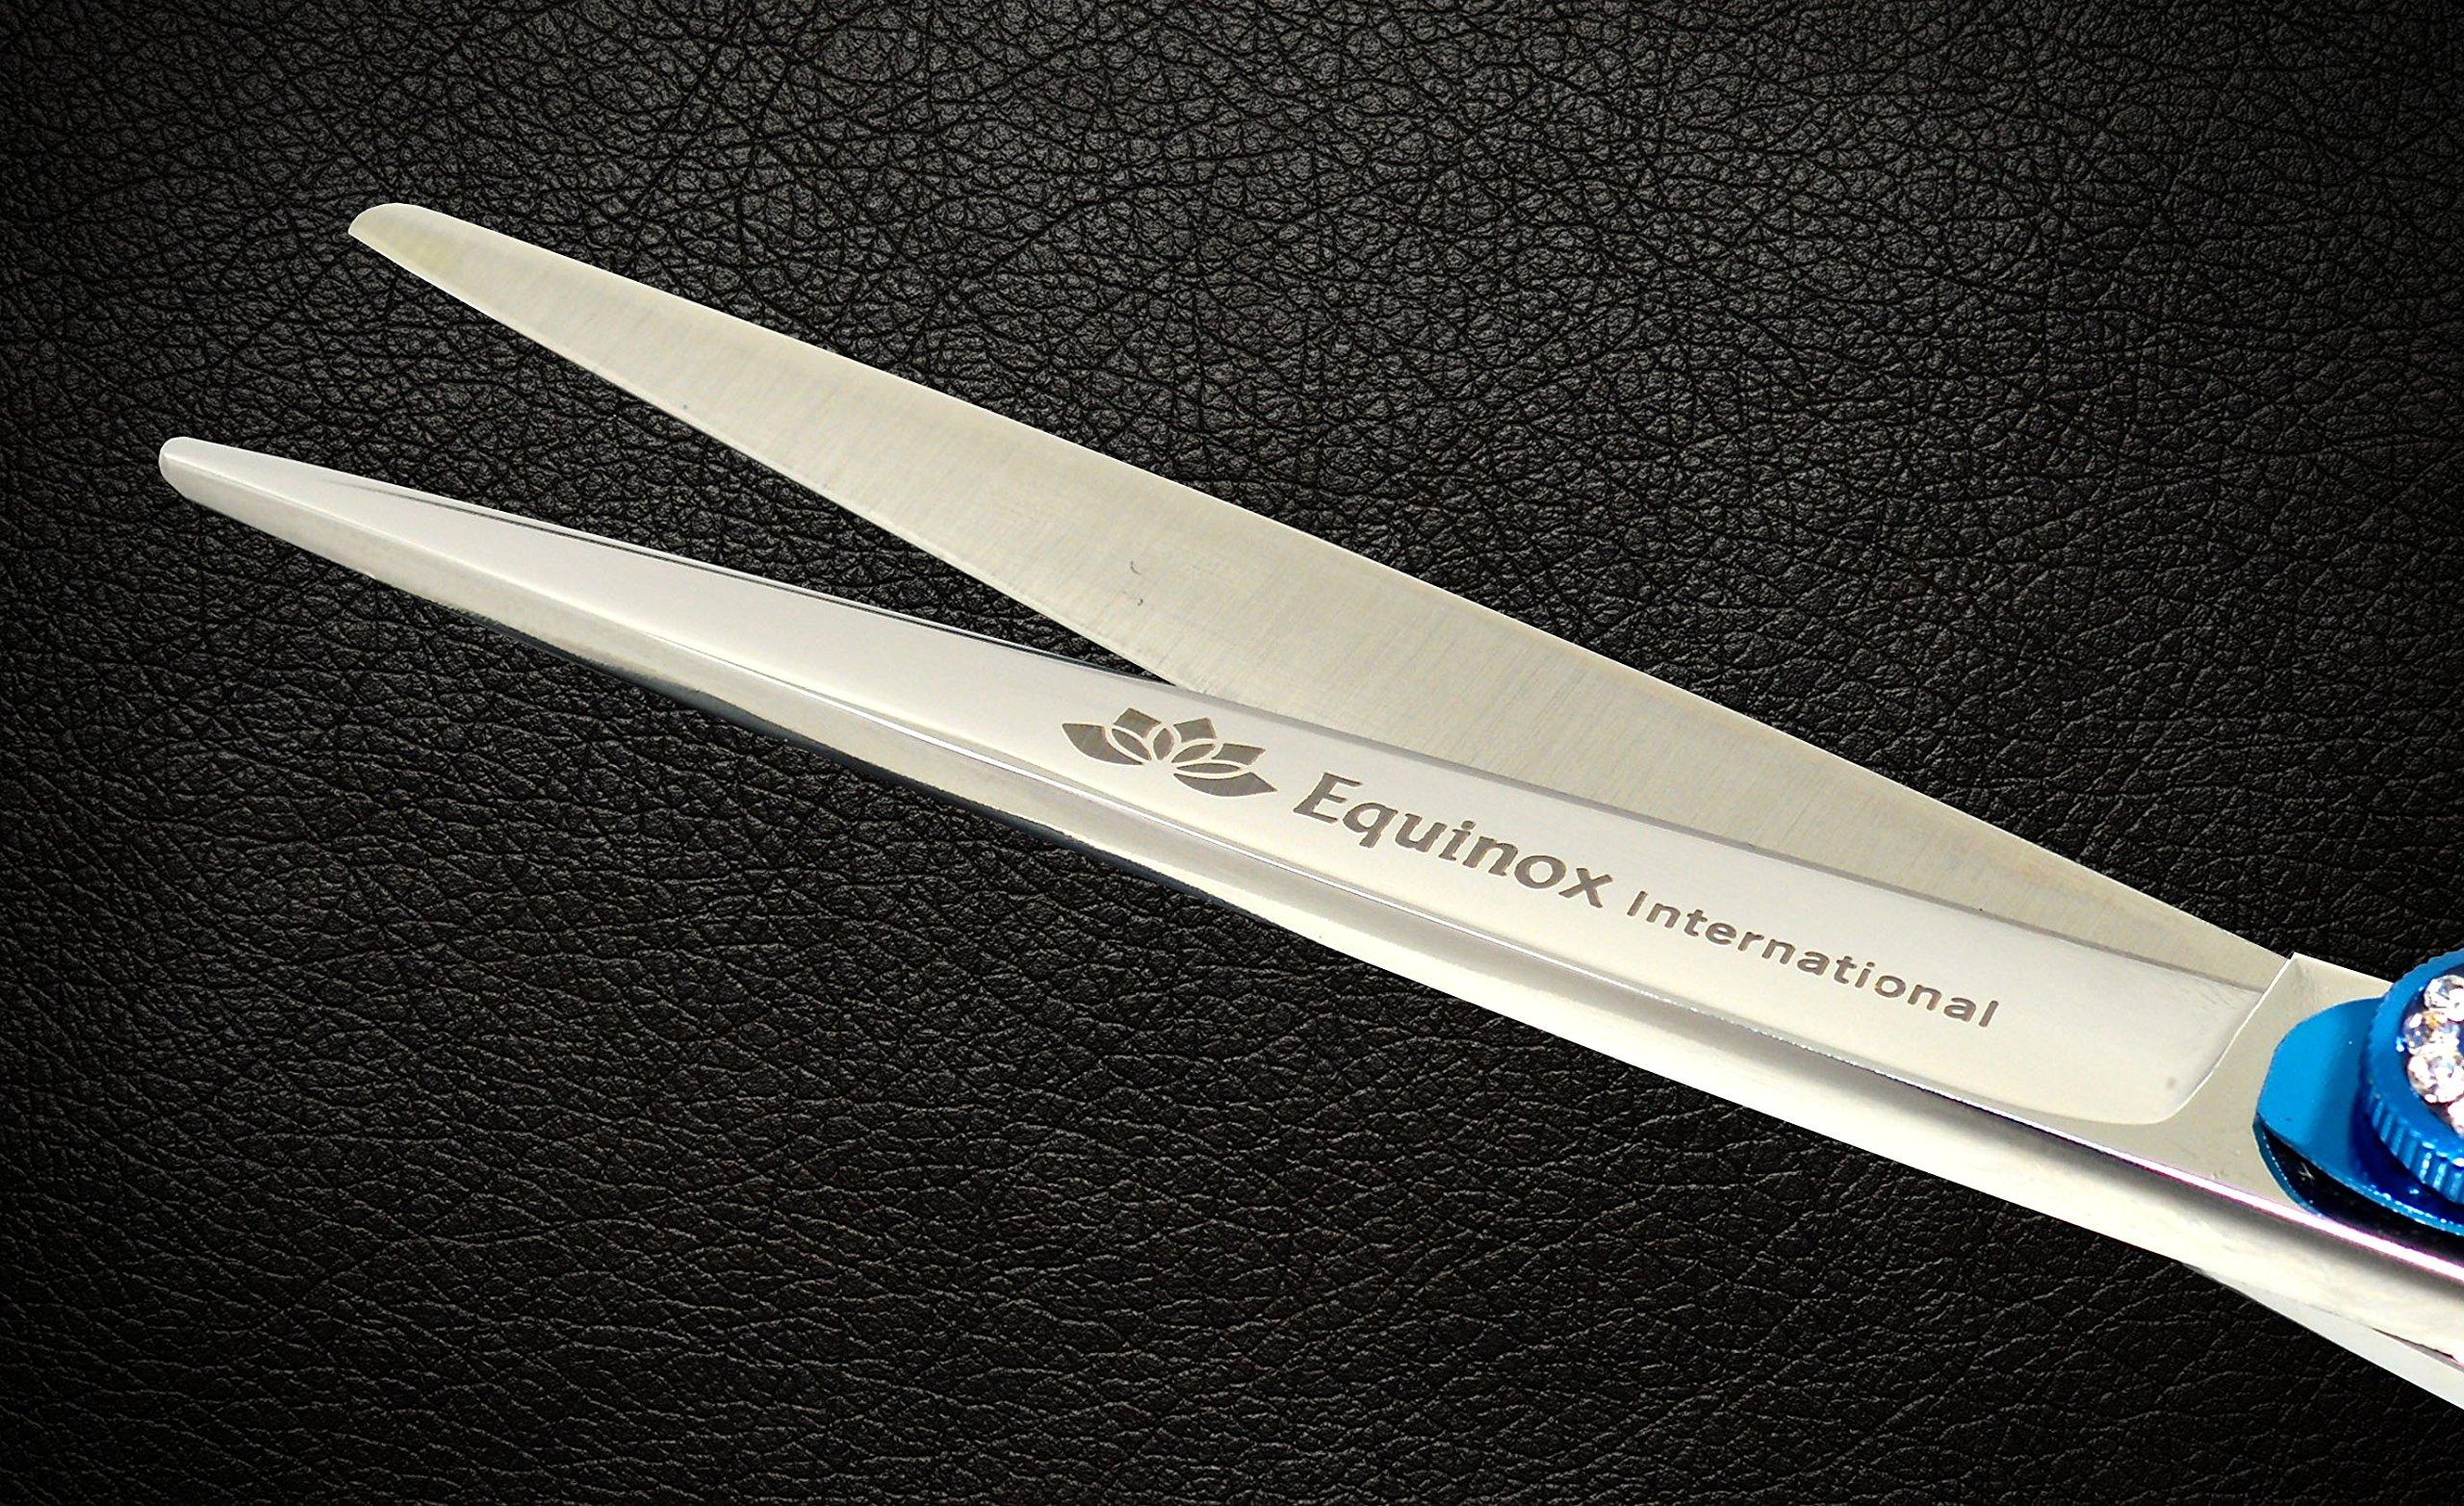 Equinox Professional Razor Edge Series - Barber Hair Cutting Scissors/Shears - 6.5'' Overall Length - Beautiful White Diamond Stones with Blue Chromium Fine Adjustment Tension Screw by Equinox International (Image #3)